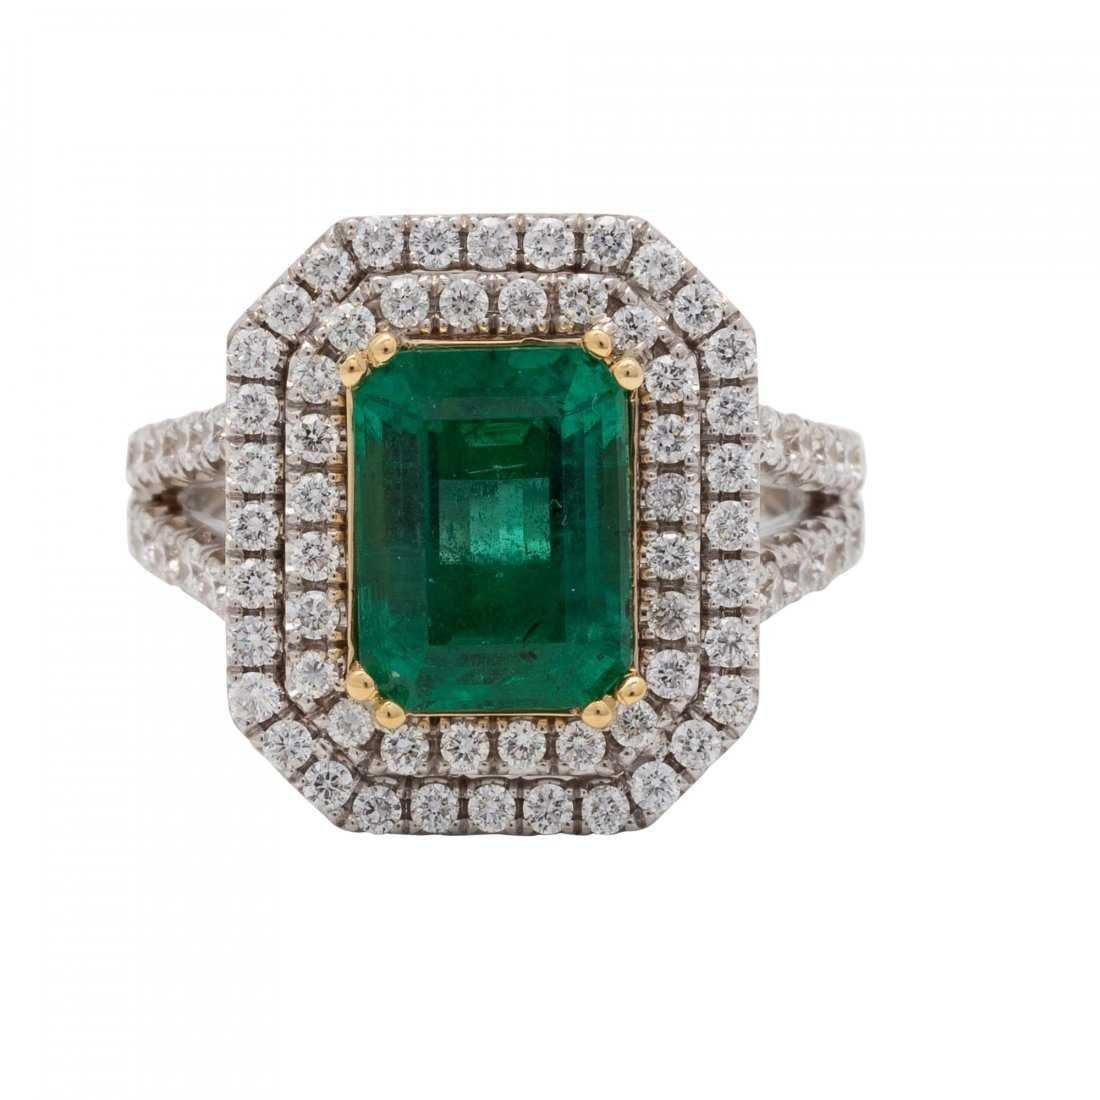 18 Karat Gold, Emerald and Diamond Ring